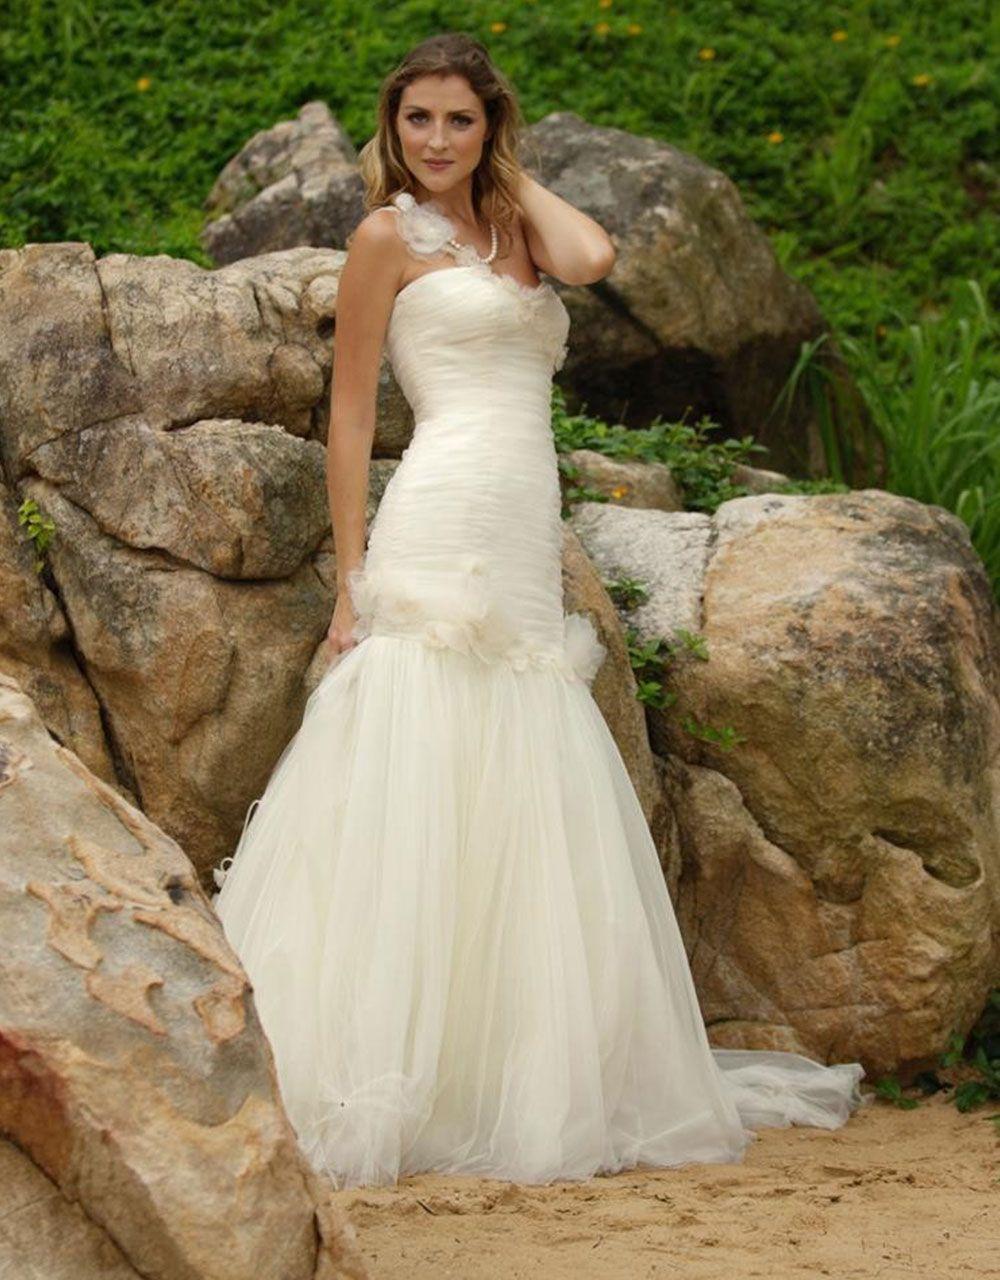 Serafina Wedding dresses, Dresses, Wedding dresses for sale